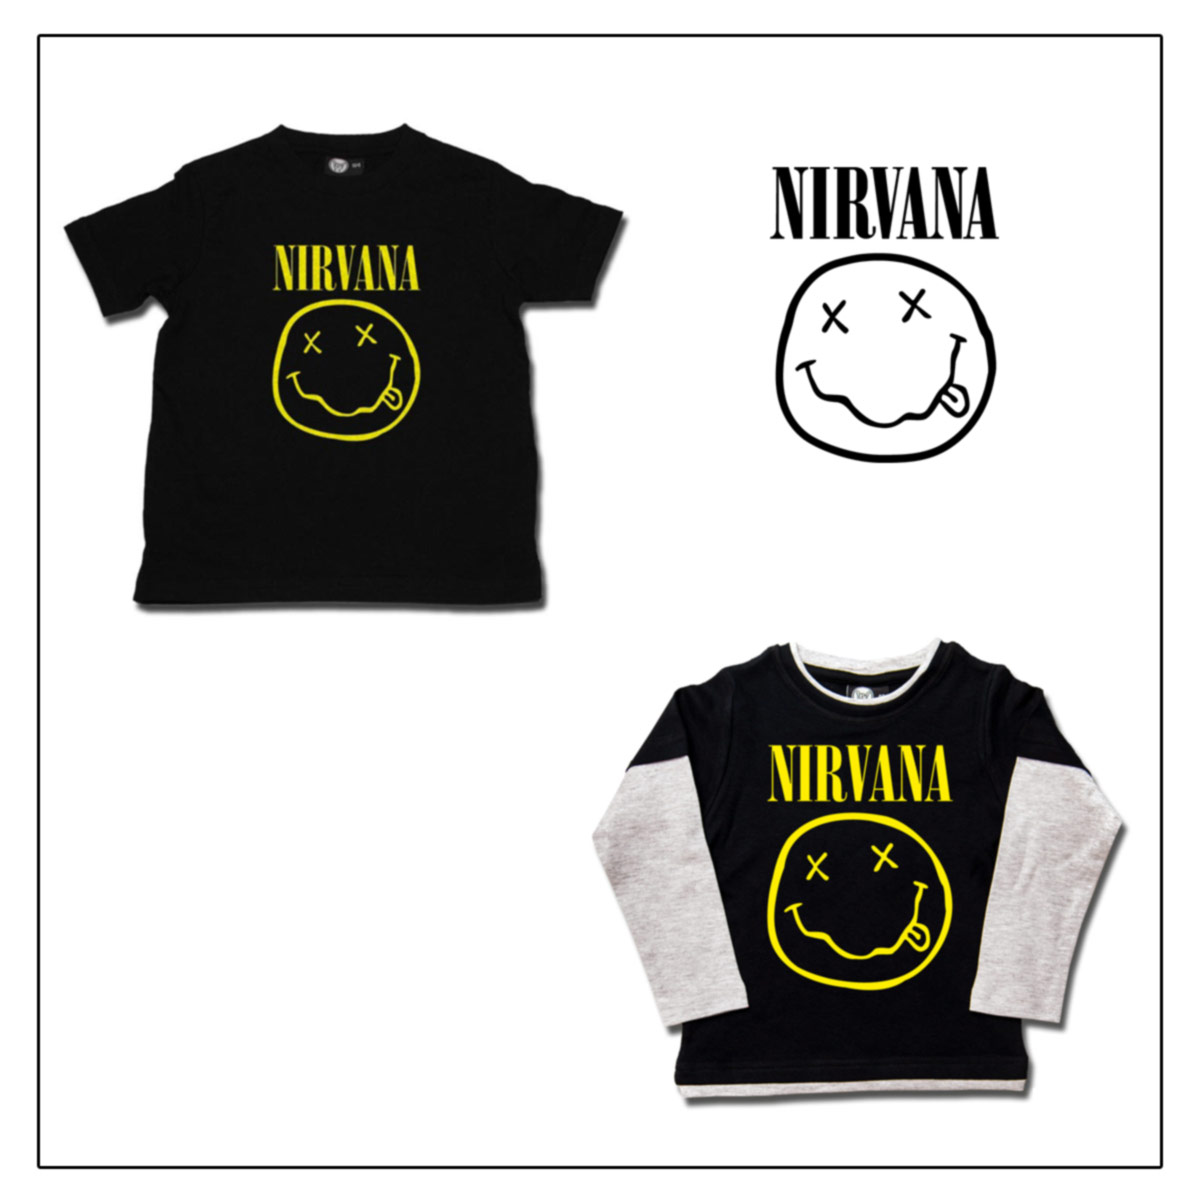 NIRVANA T-shirt Bambino 2-12 anni